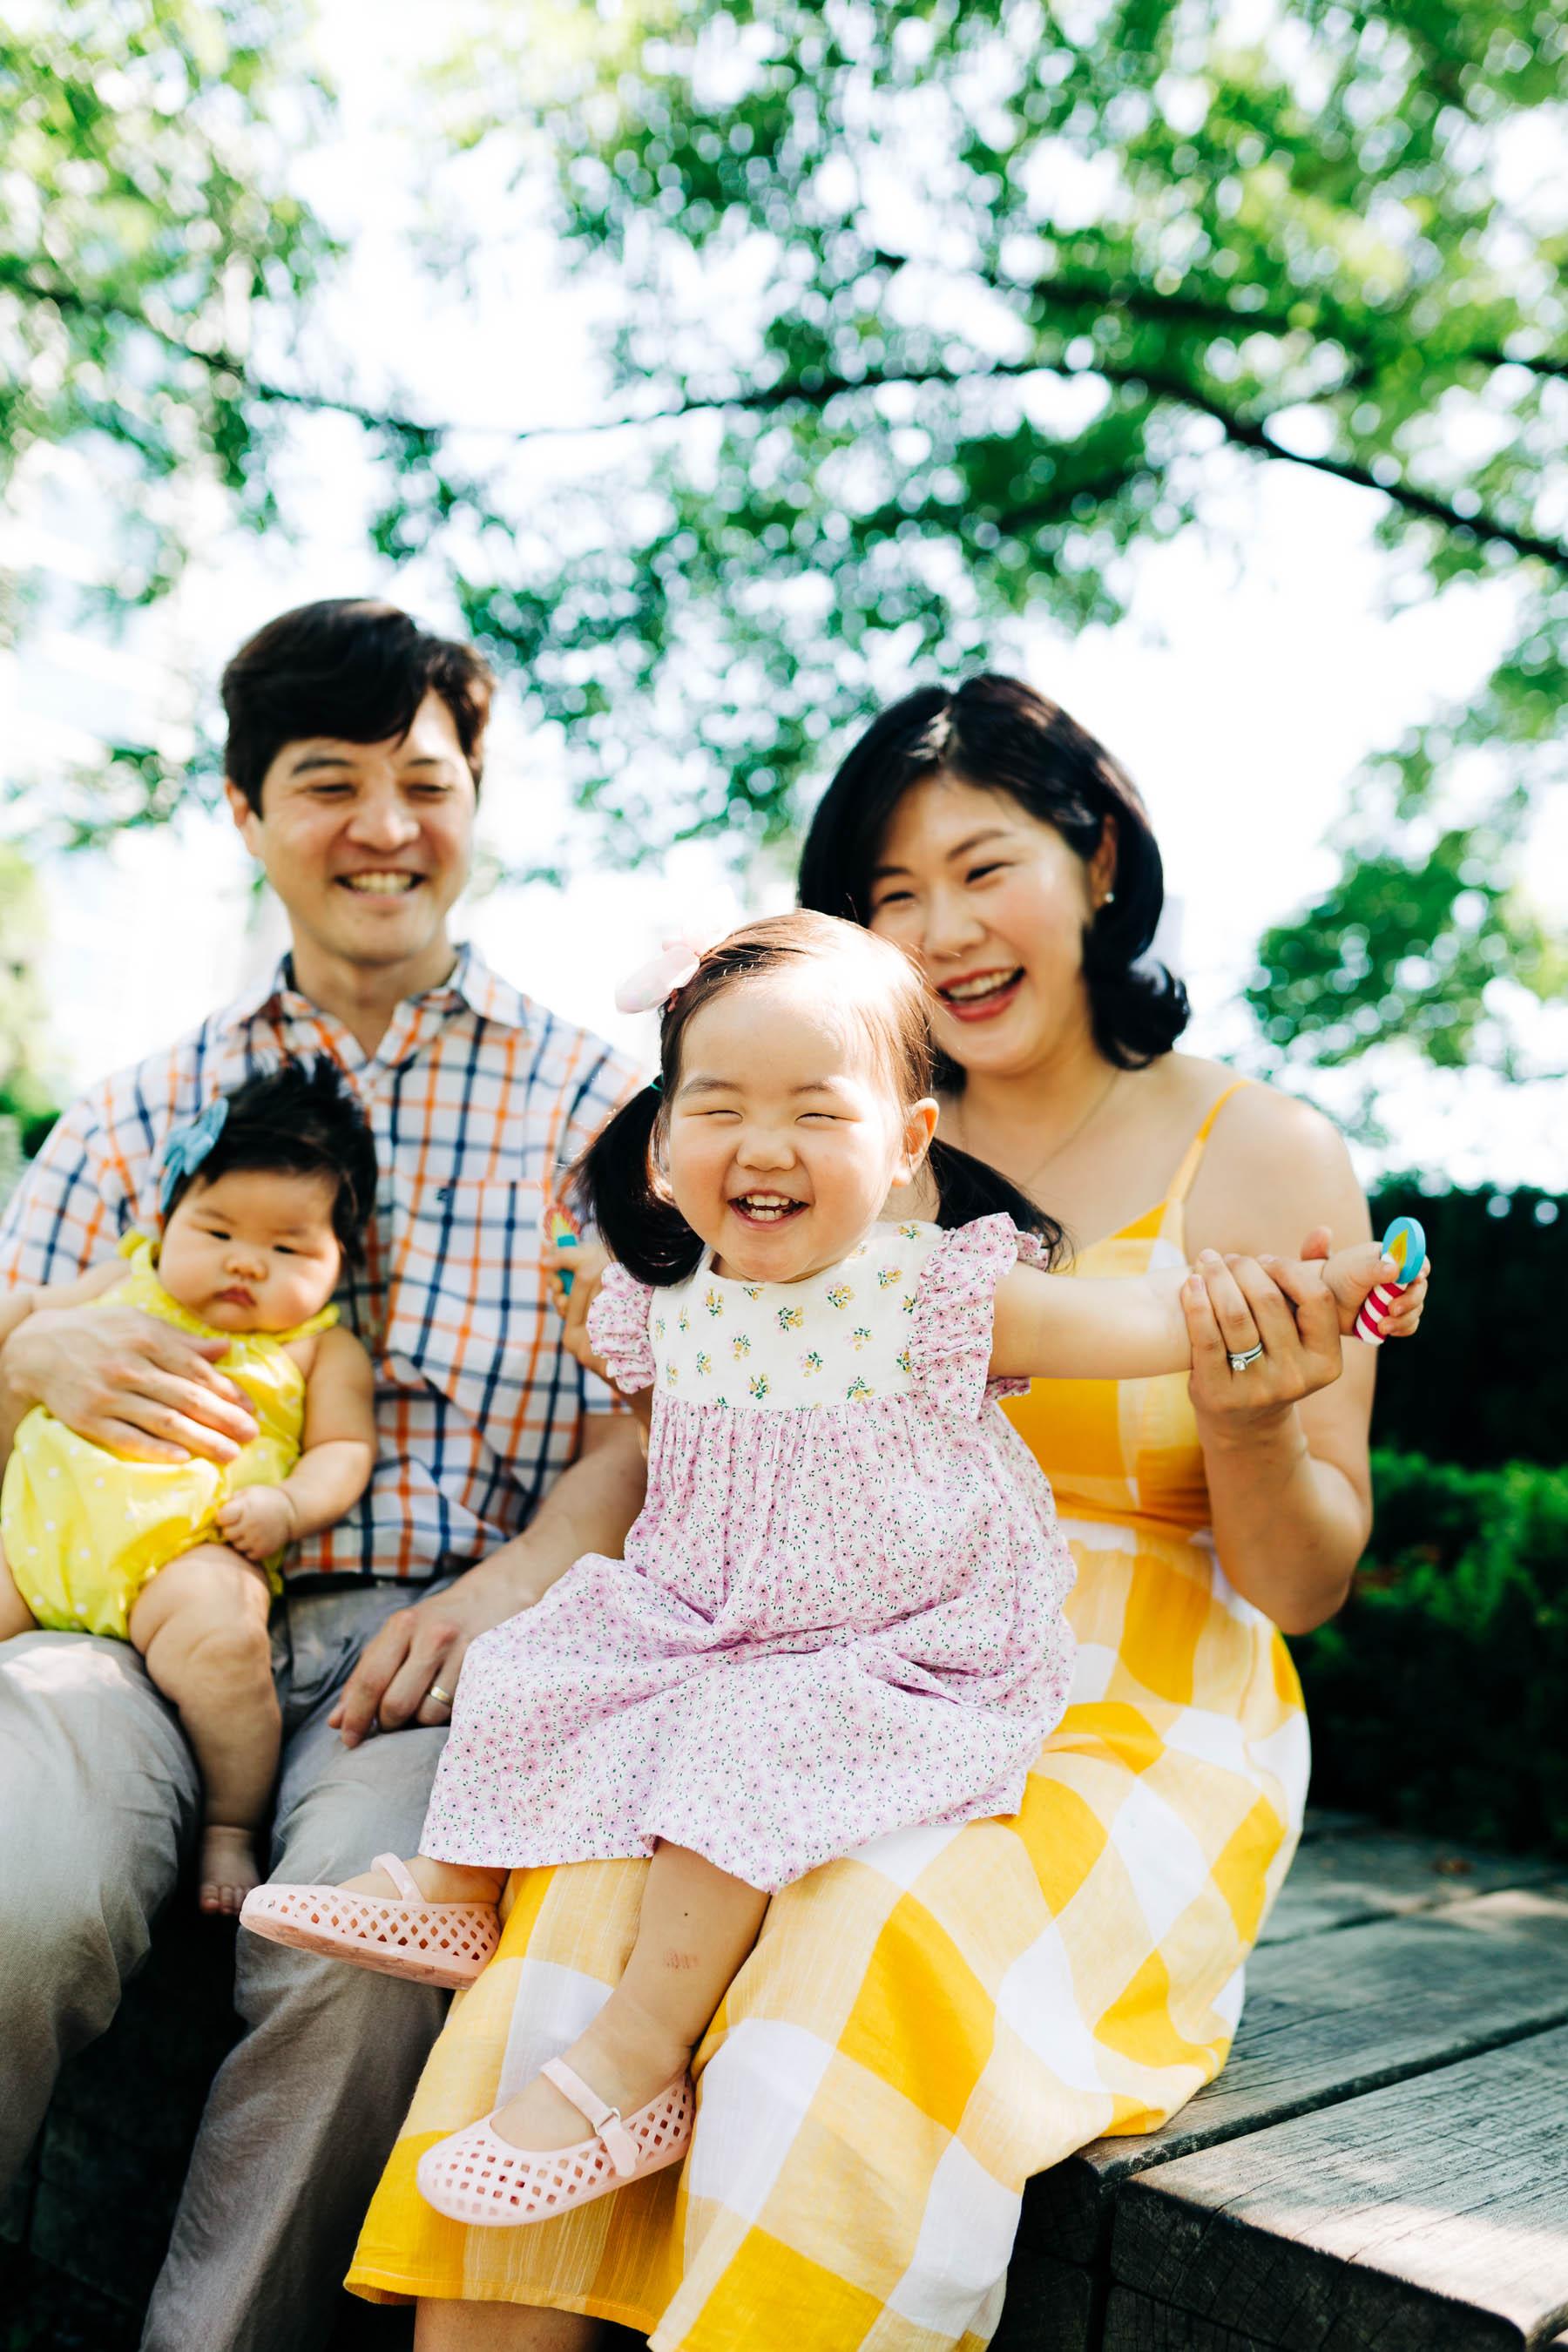 chicago-family-lifestyle-photographer-6.jpg